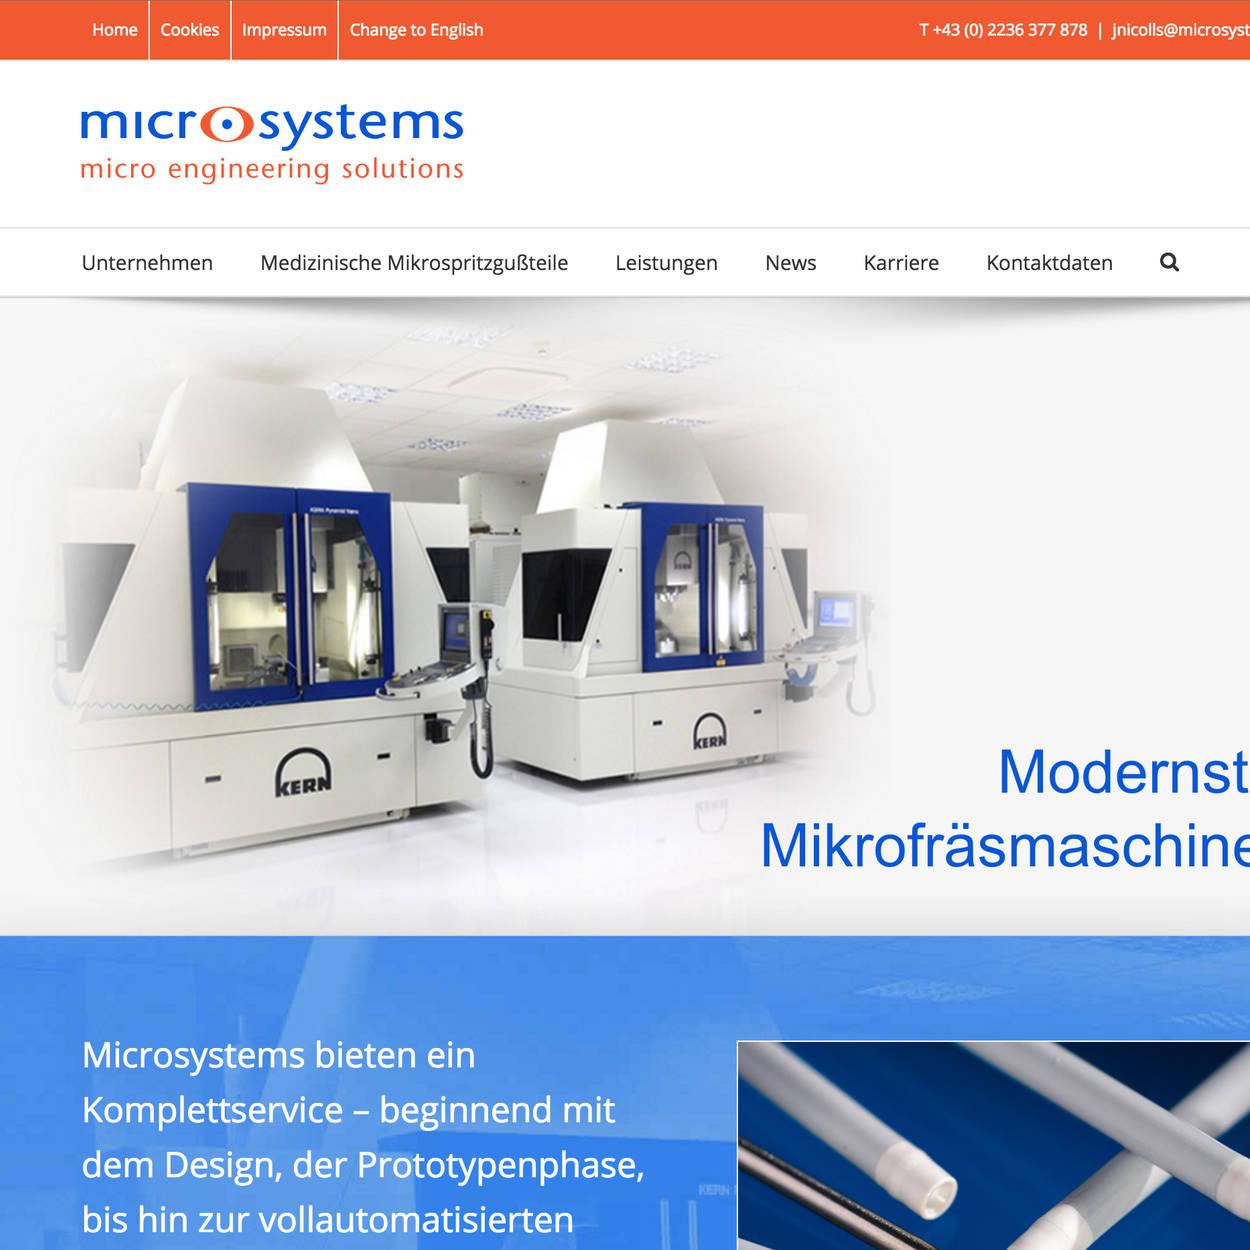 orangebox-web-design-microsystems-austria-german-language